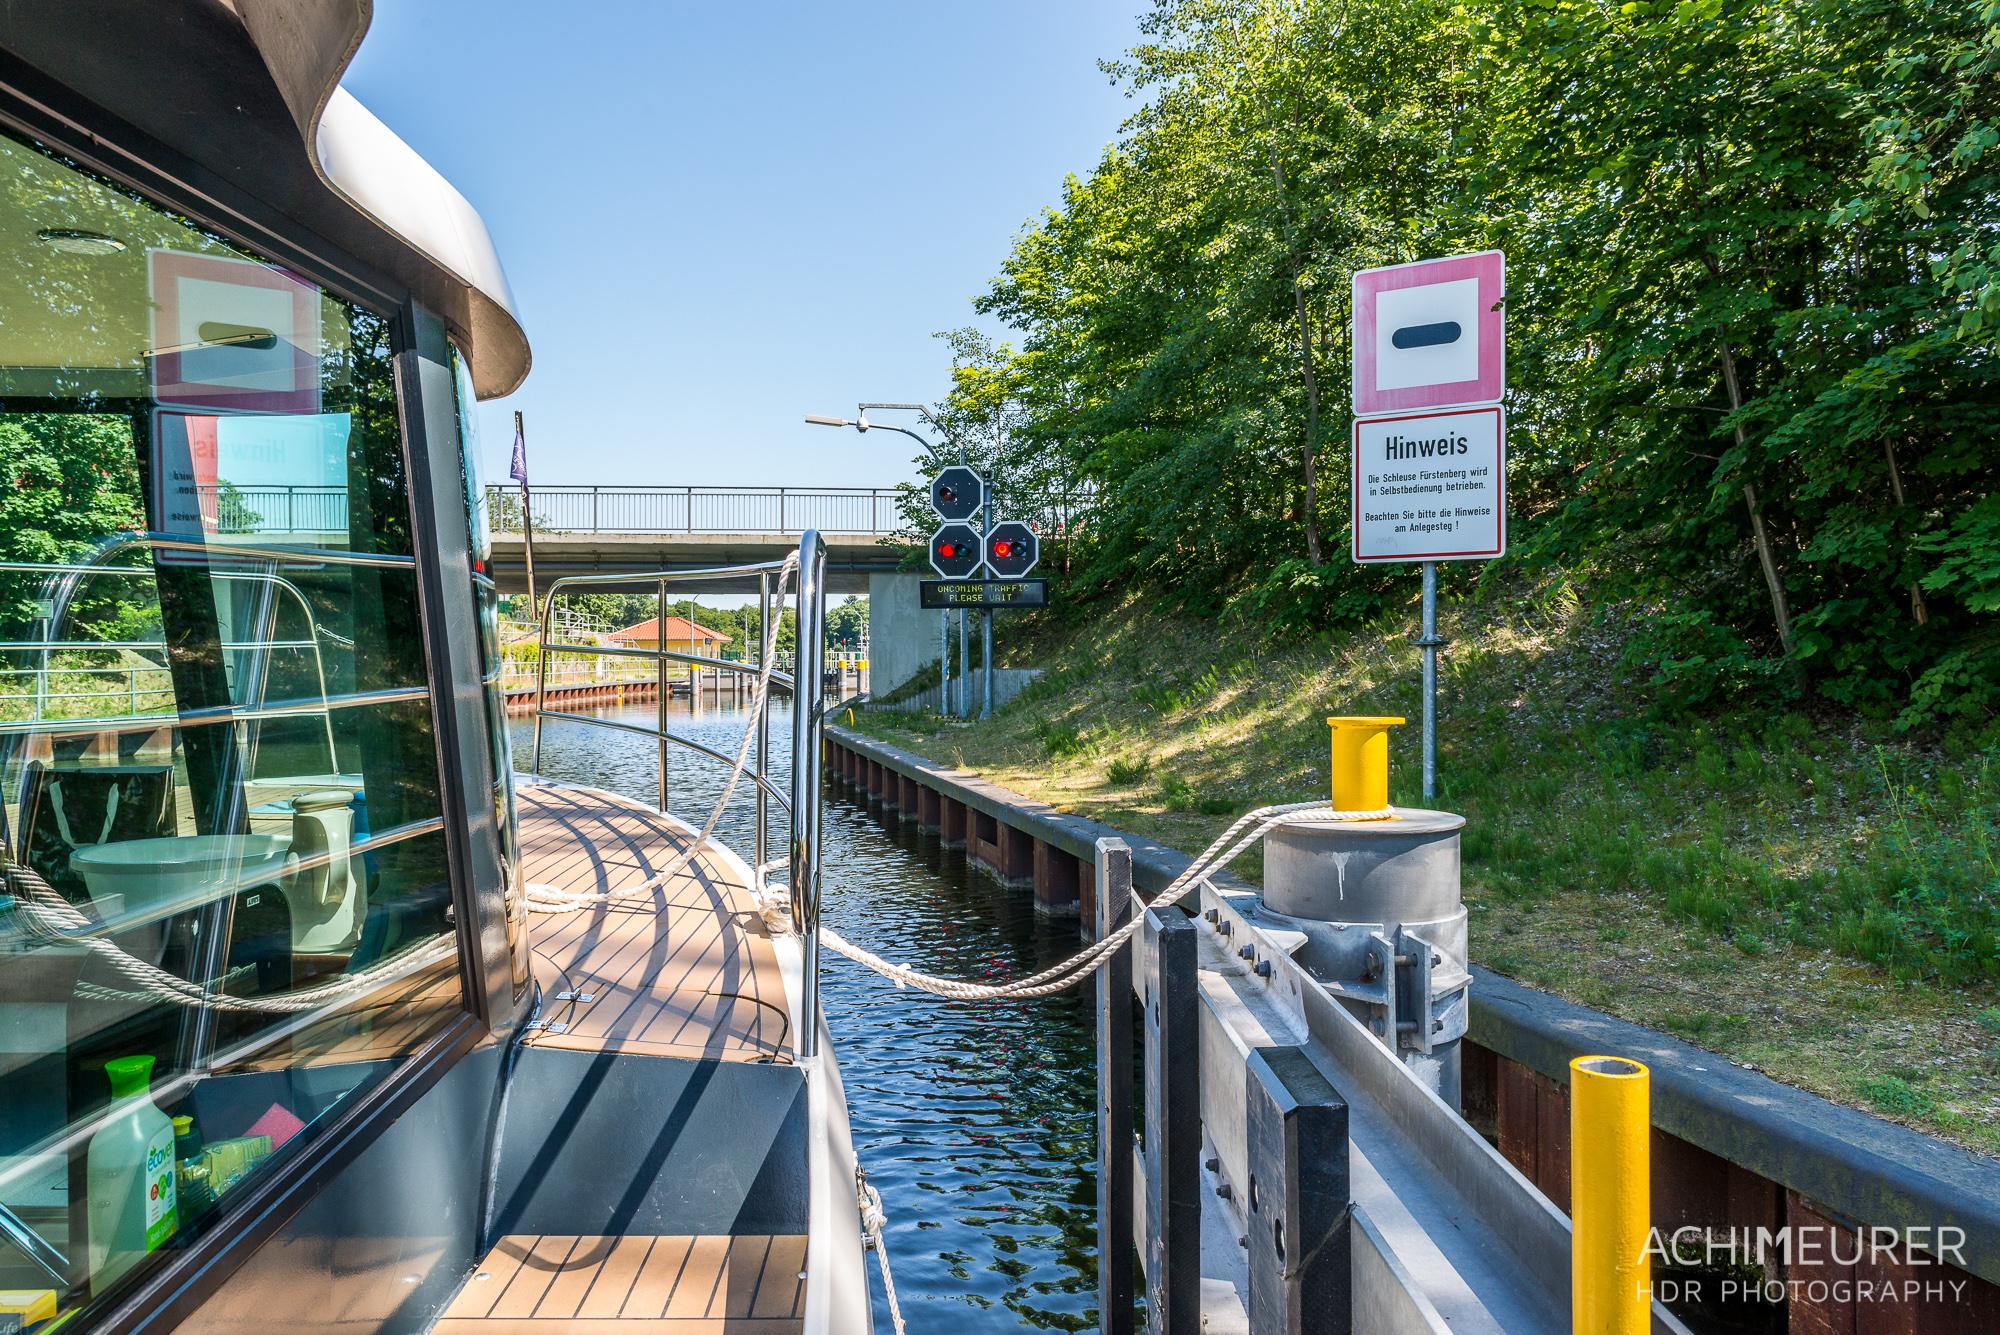 Hausboot-Kuhnle-Mueritz-Mecklenburg-Vorpommern-See_3185